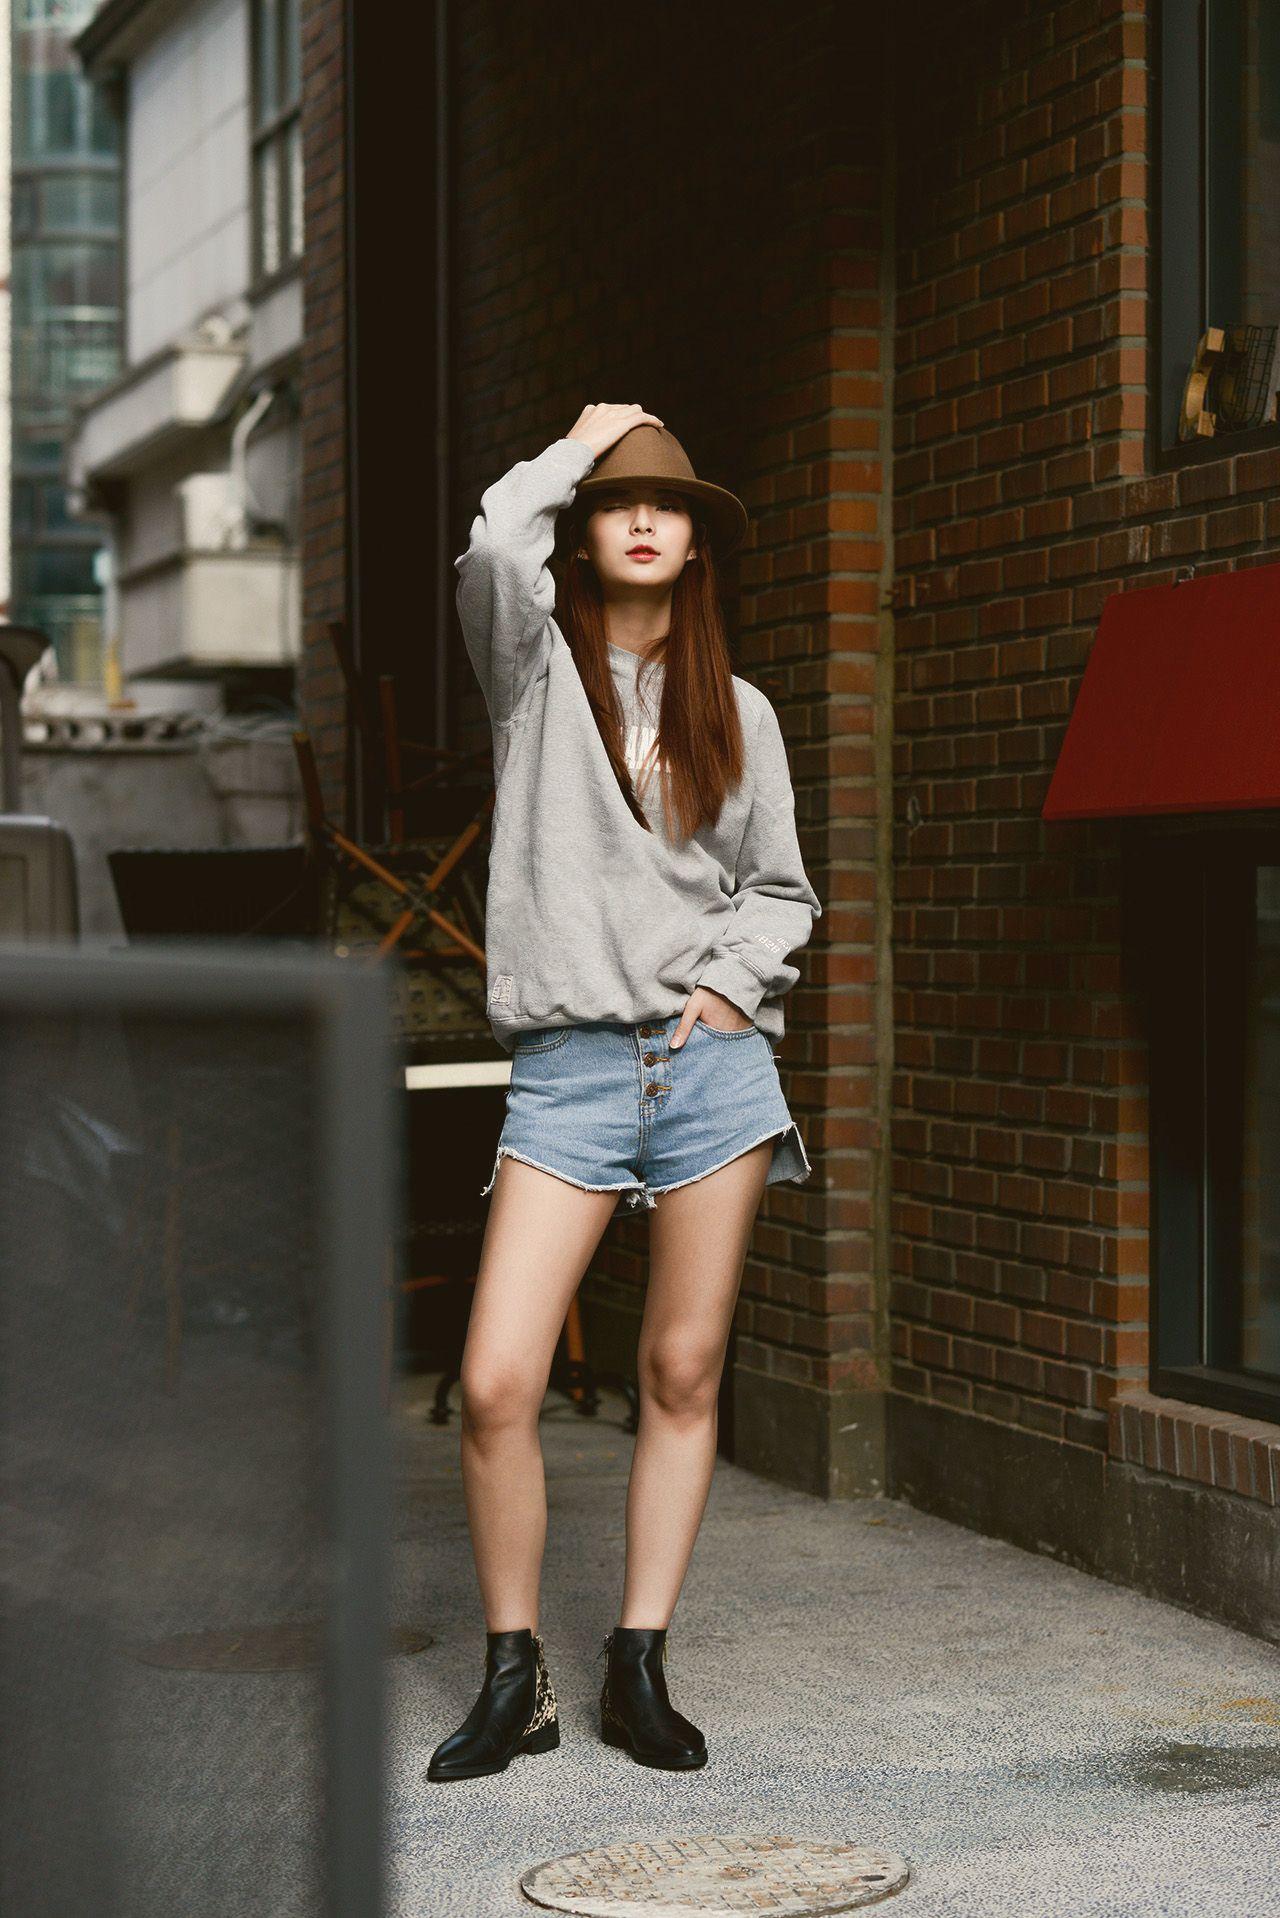 Model : Oh Hye Rim (YG Kplus) wearing EEIGHT shoes